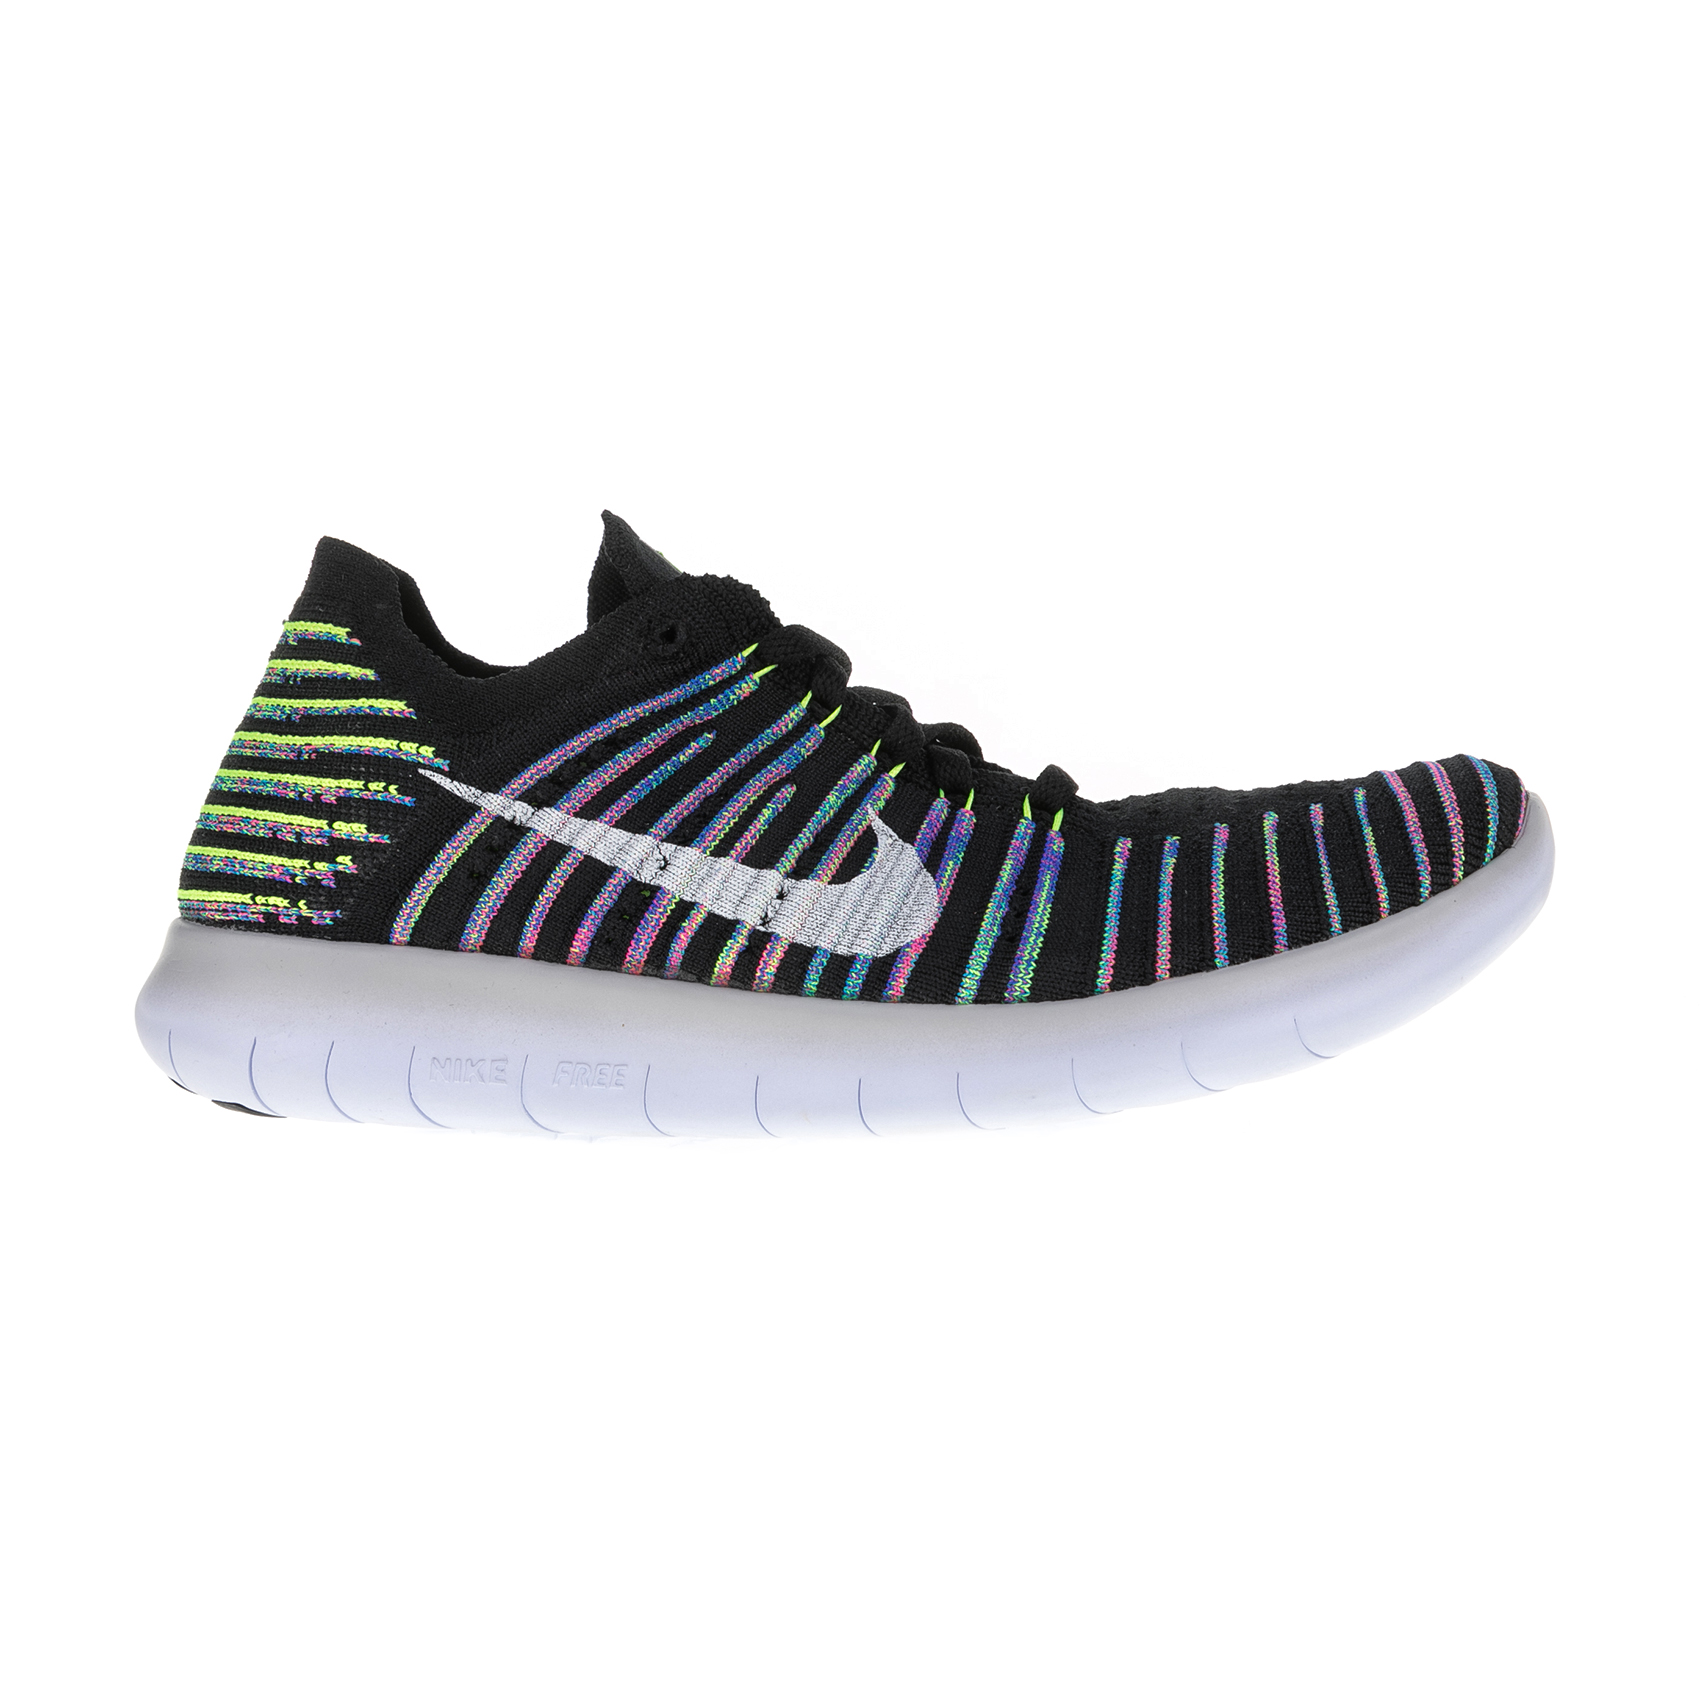 NIKE – Γυναικεία αθλητικά παπούτσια Nike FREE RN FLYKNIT μαύρα – πράσινα